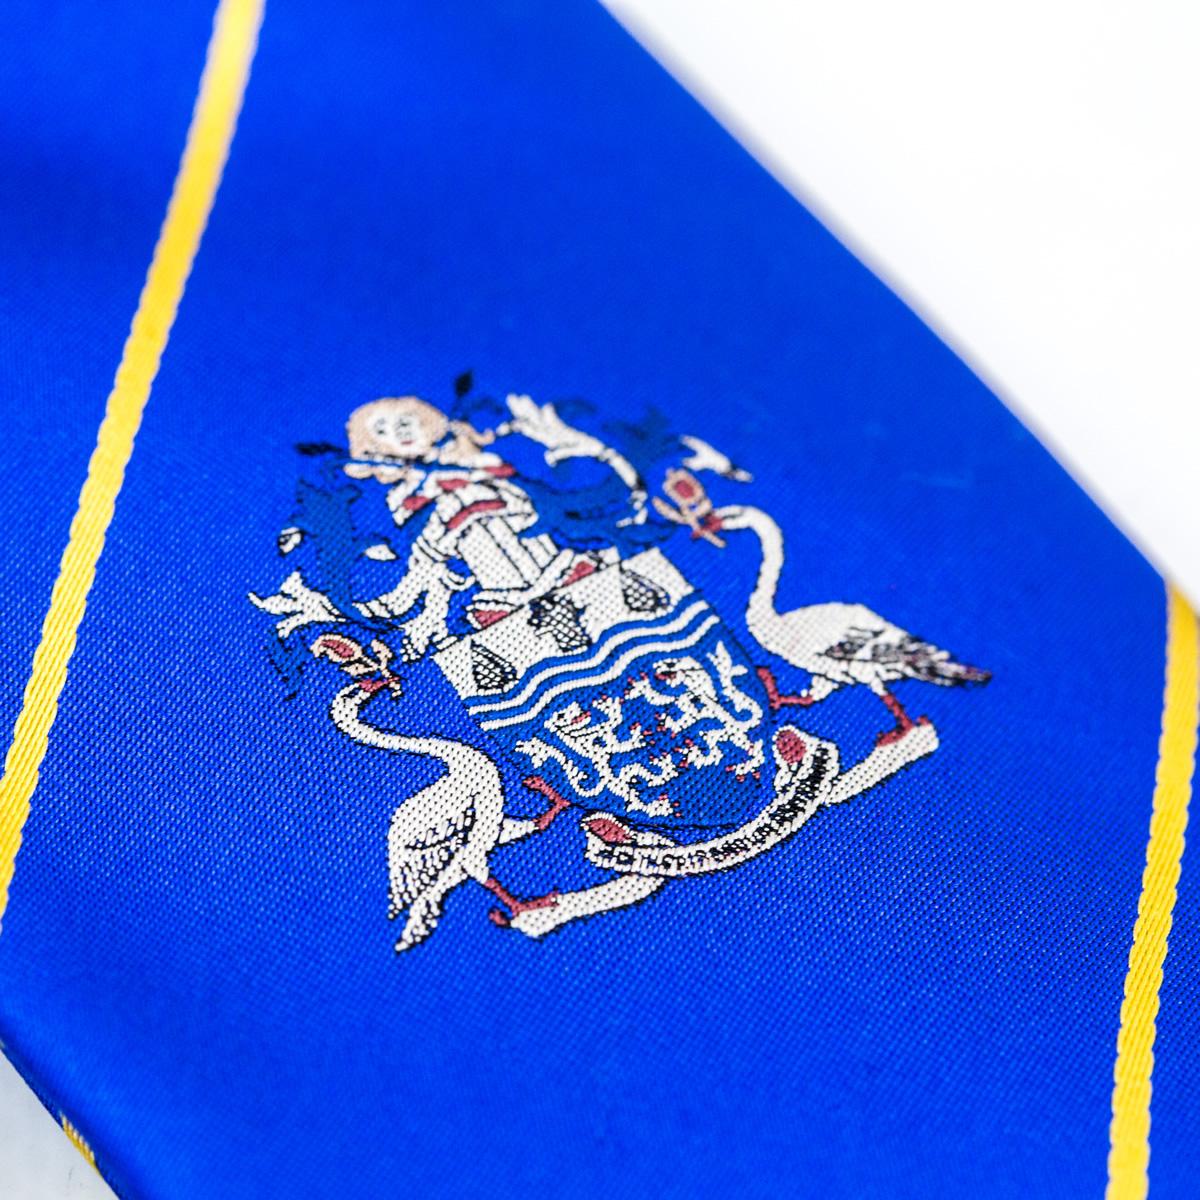 custom association ties, personalised association ties, silk association ties